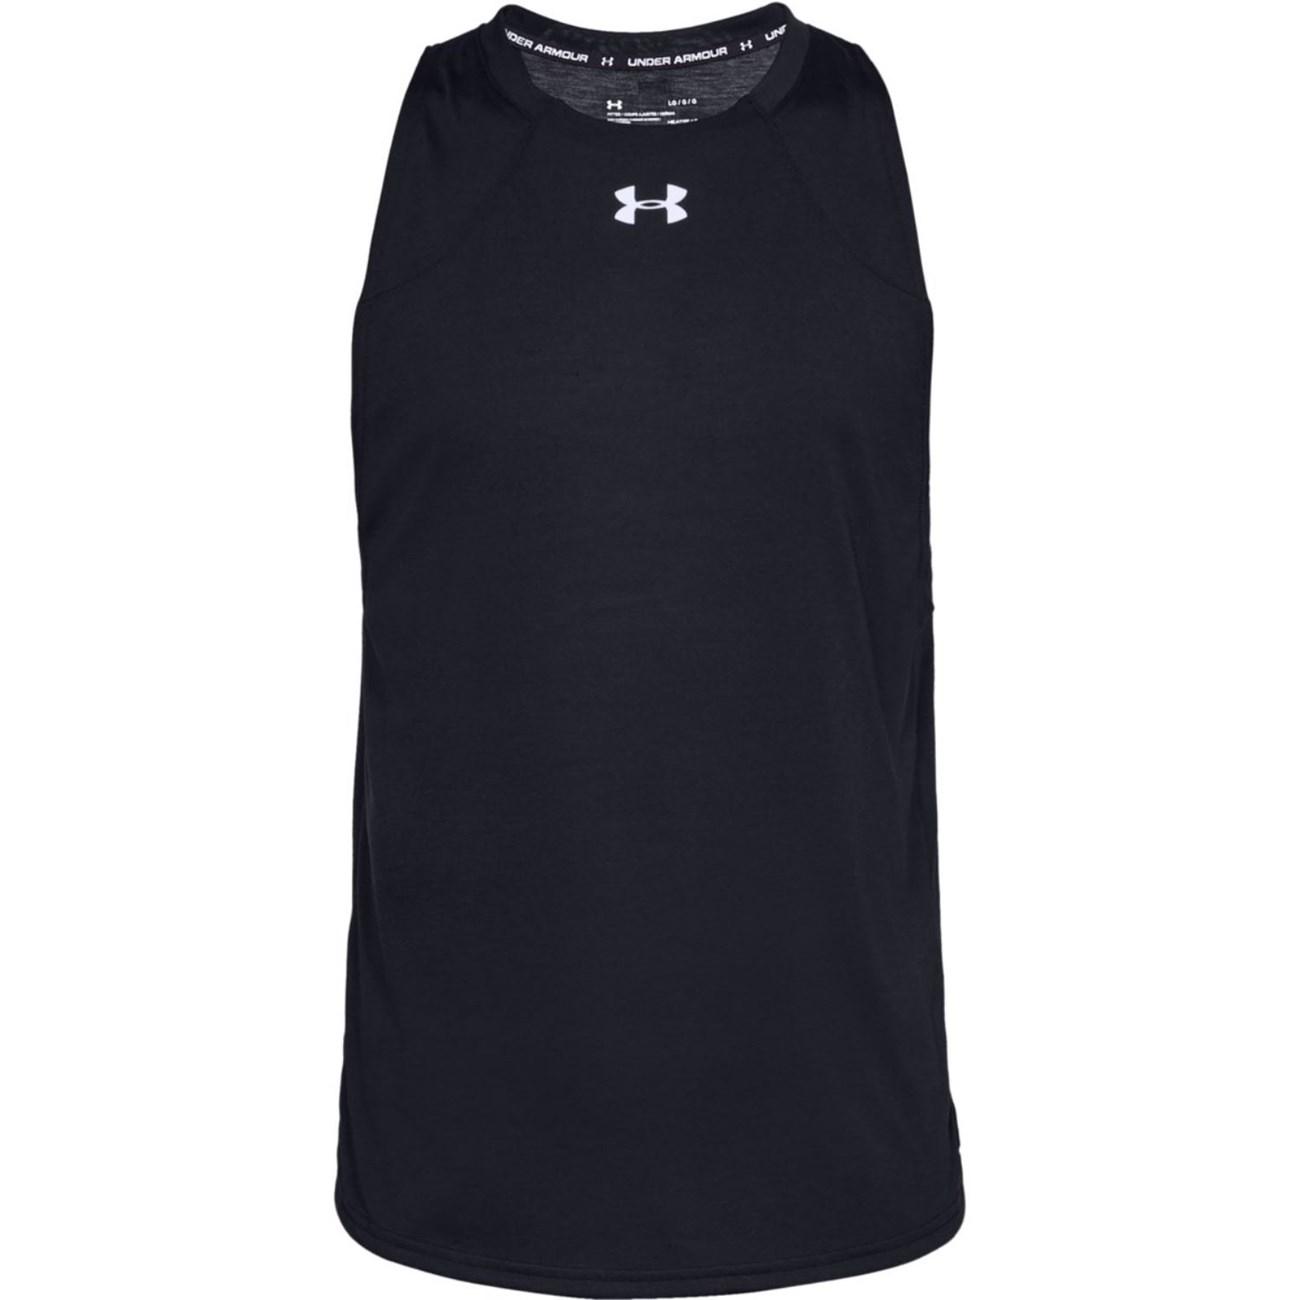 e5eed4973949 UNDER ARMOUR UA BASELINE PERFORMANCE TANK   Ανδρικά Αμάνικα T-shirts ...